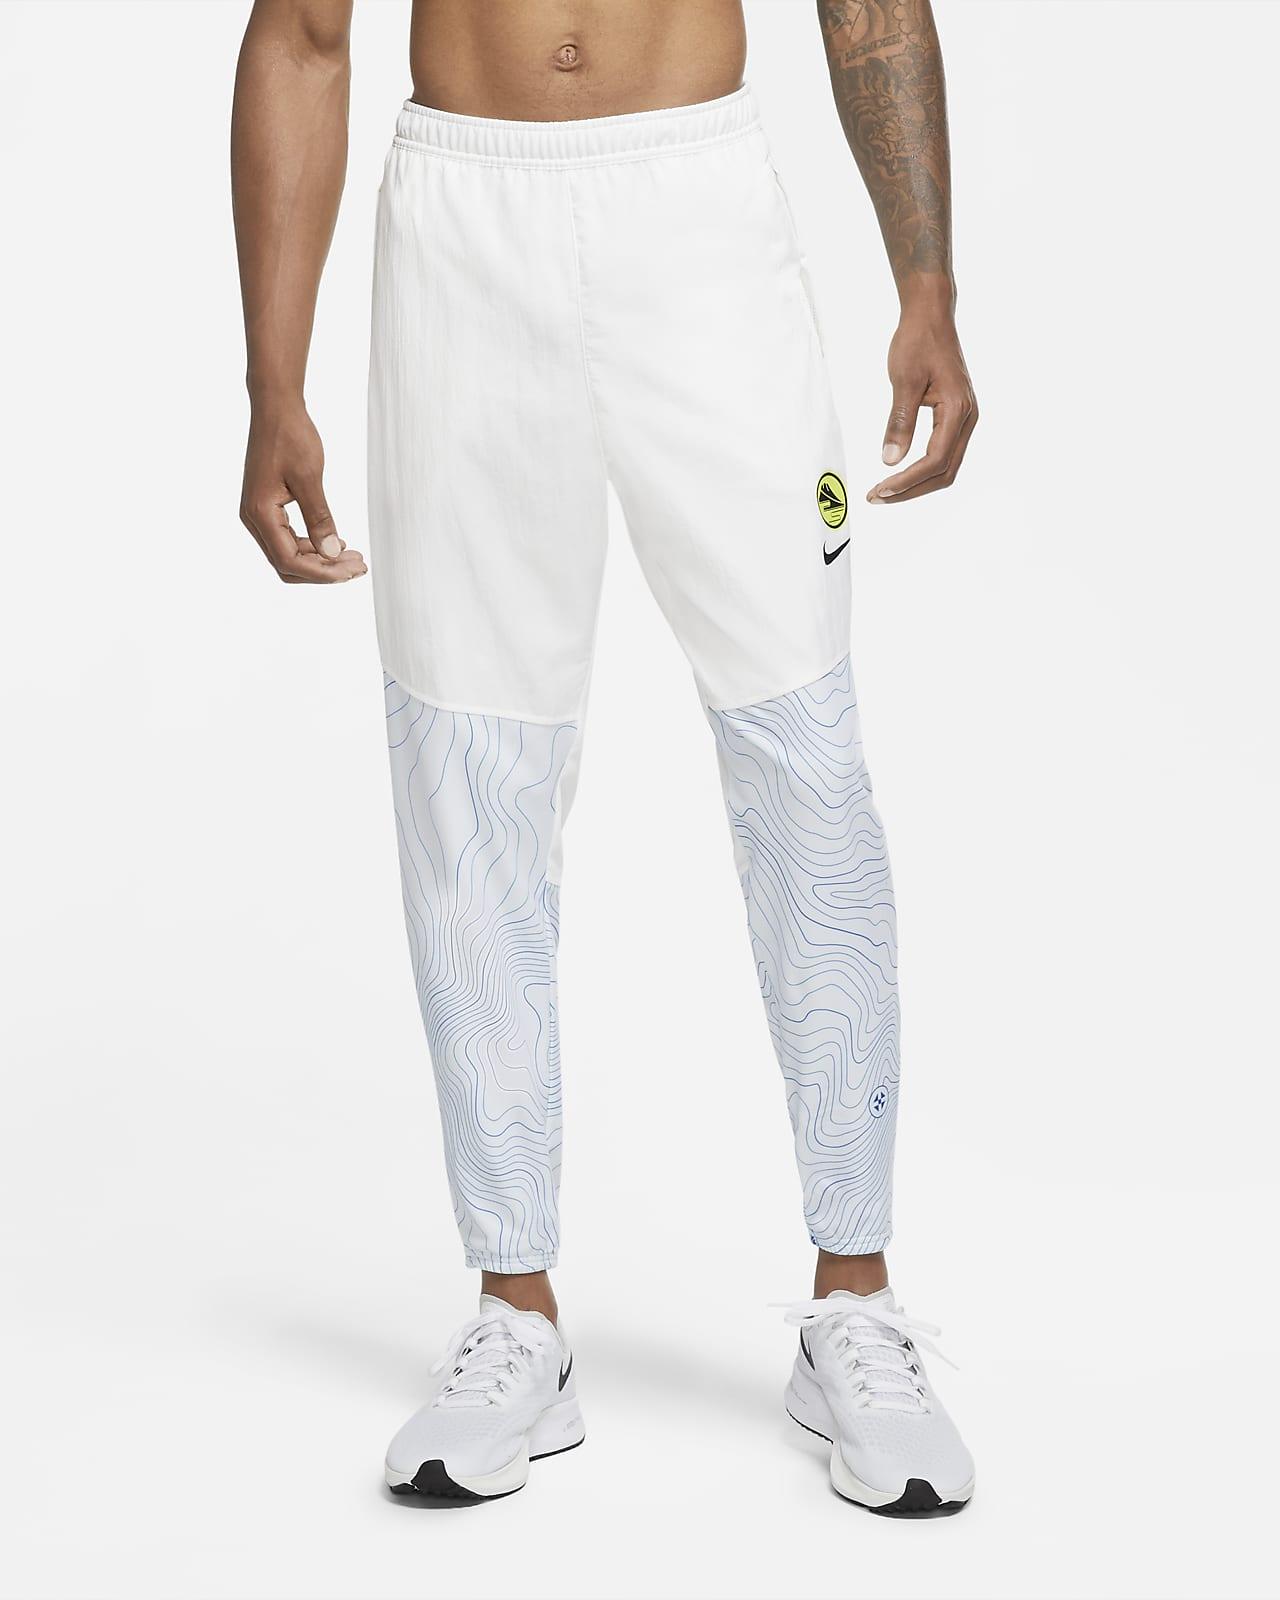 Nike Therma Essential Erkek Koşu Eşofman Altı